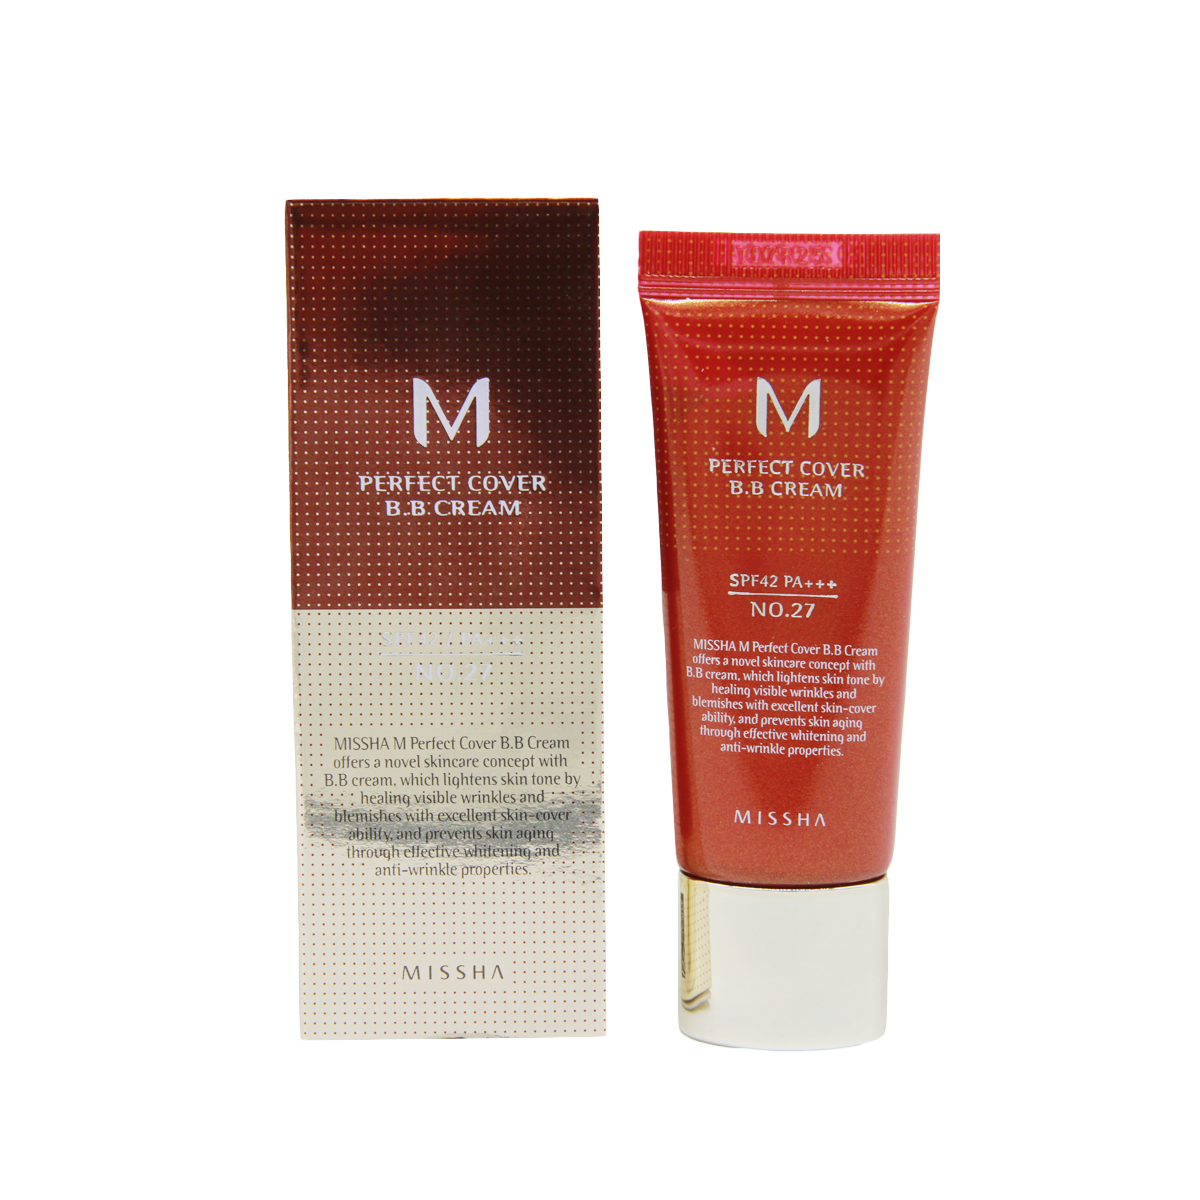 Декоративная косметика Тональный крем для лица M Perfect Cover BB Cream (No.27), 20 мл import_files_57_5780316461eb11e980fc3408042974b1_95fd1fa061ff11e980fc3408042974b1.png